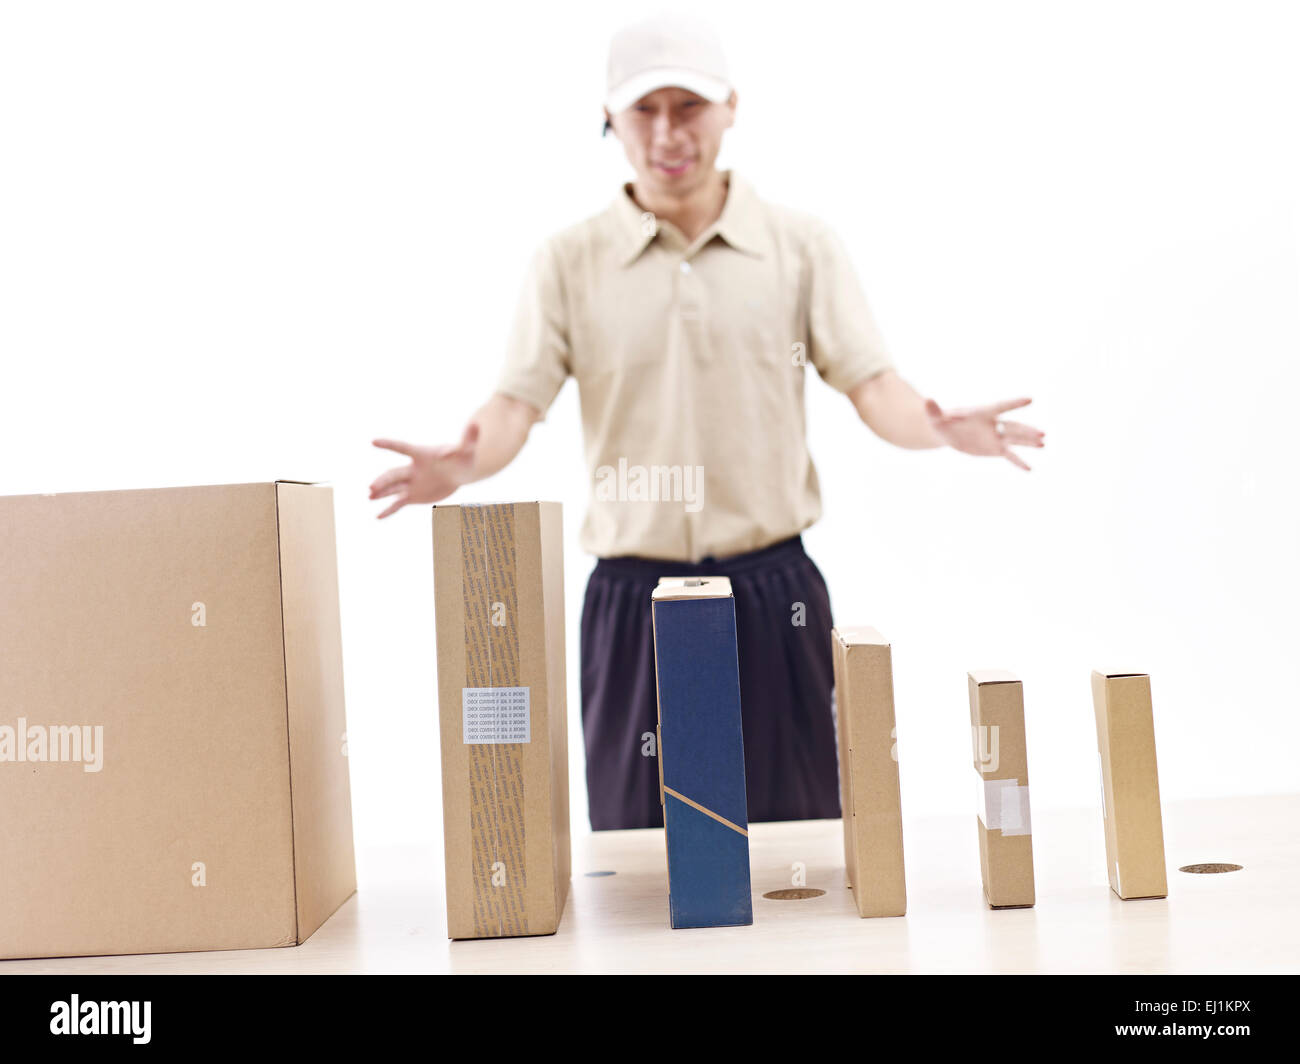 managing shipment - Stock Image